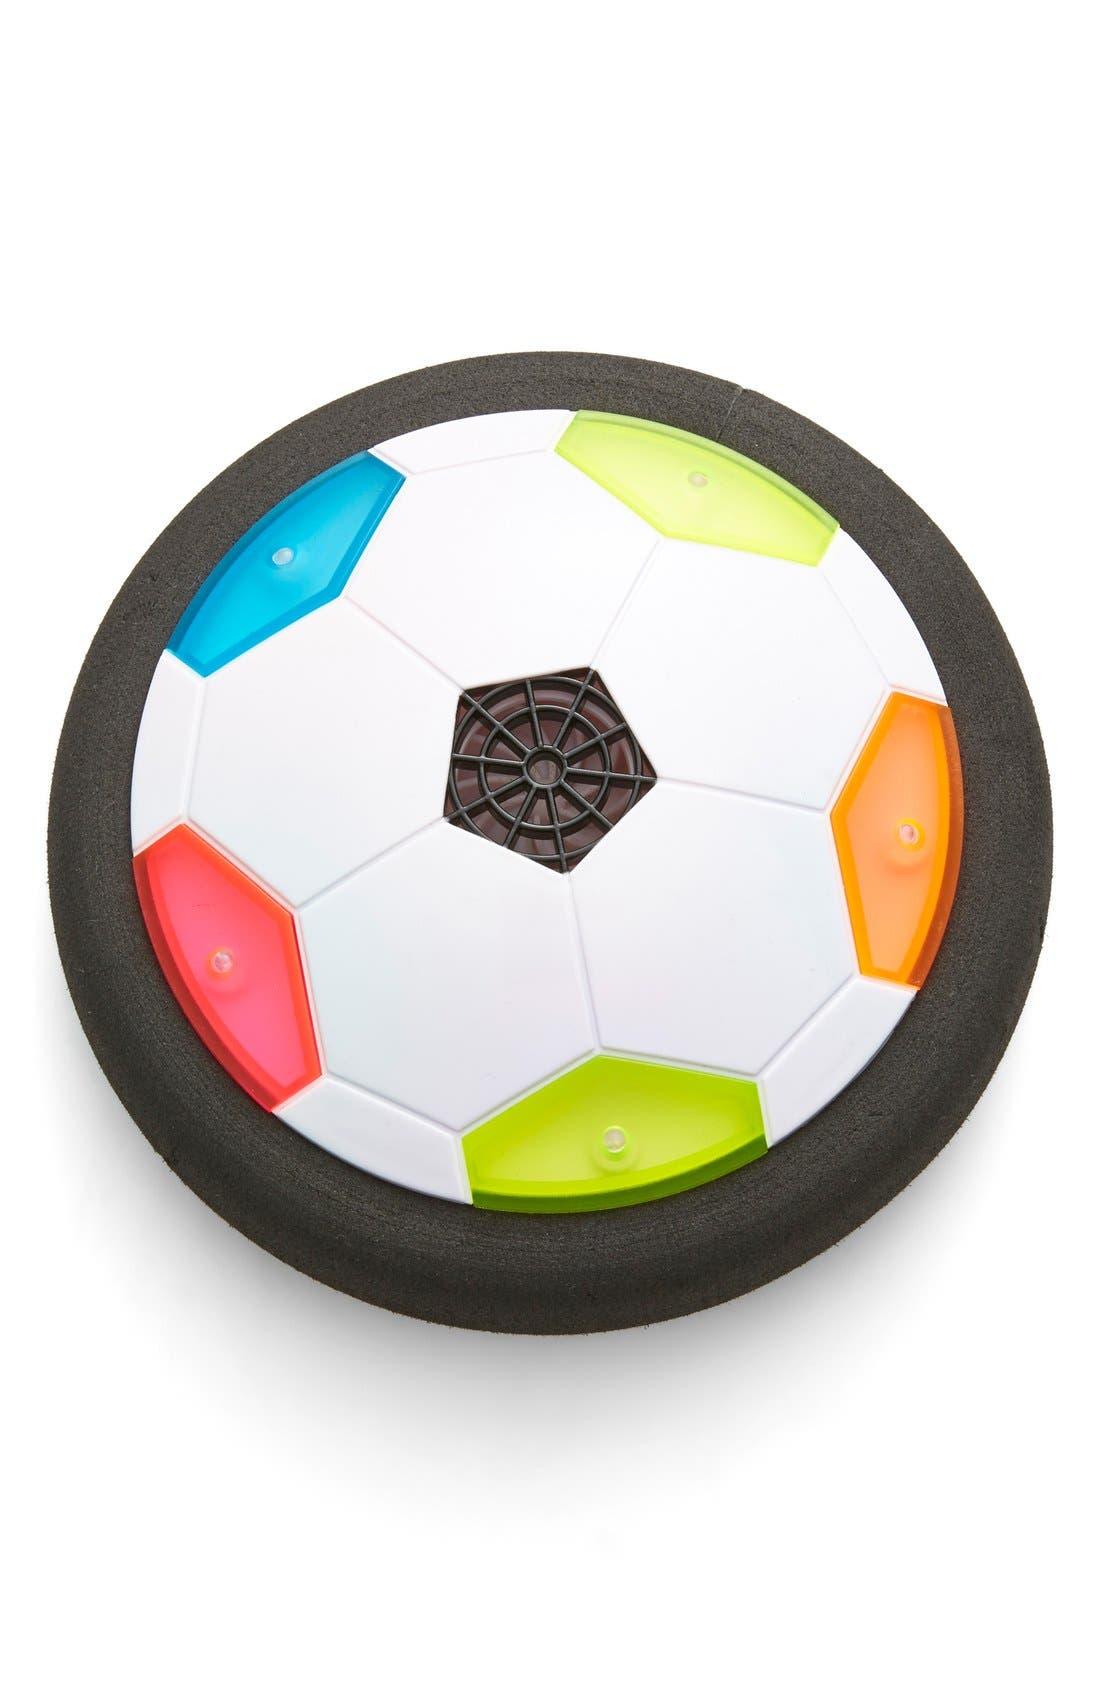 Main Image - Can You Imagine UltraGlow Light-Up Air Power Soccer Disk